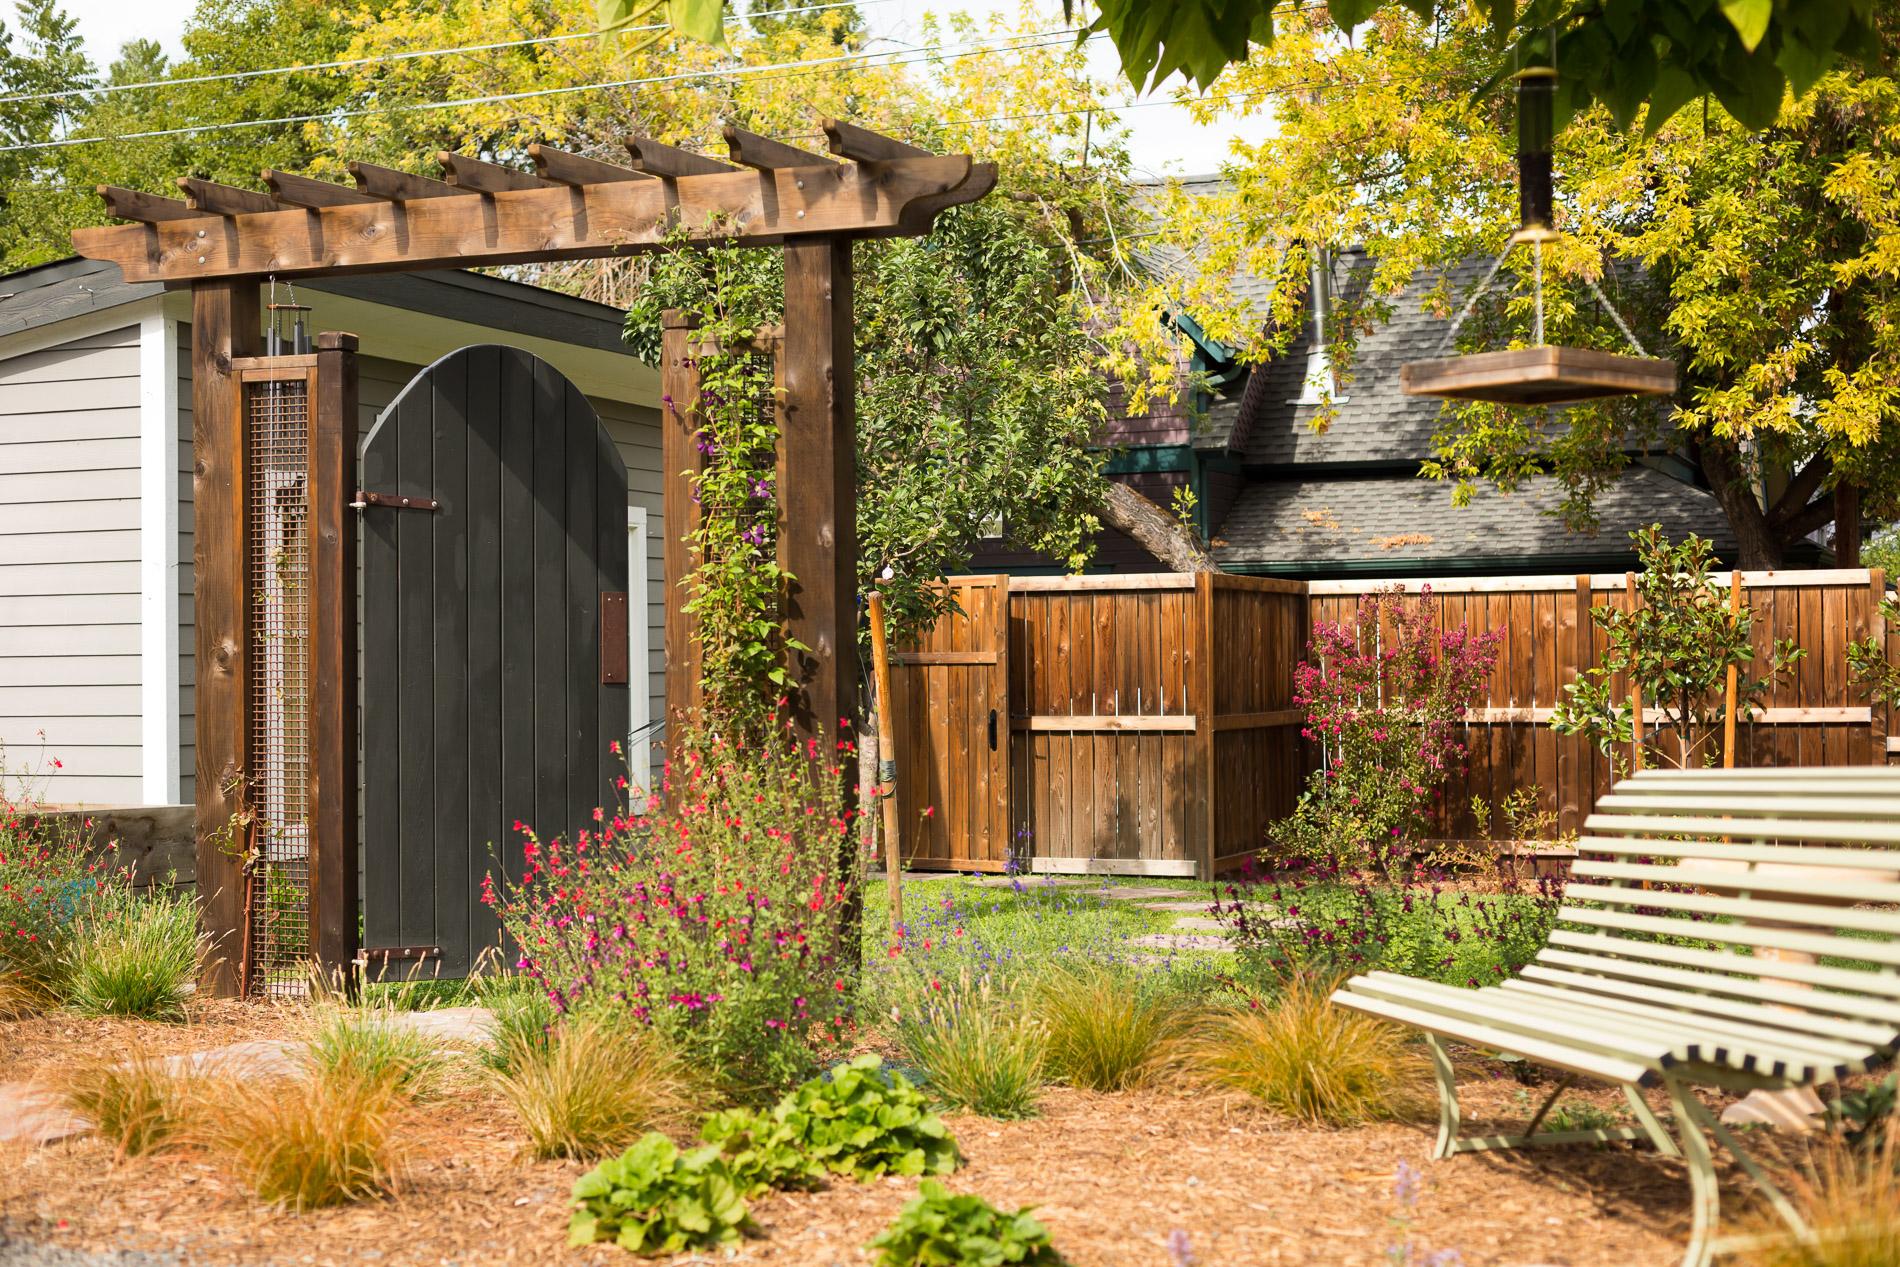 Cedar Gate Arbor + Drought-Tolerant Grasses + Perennials